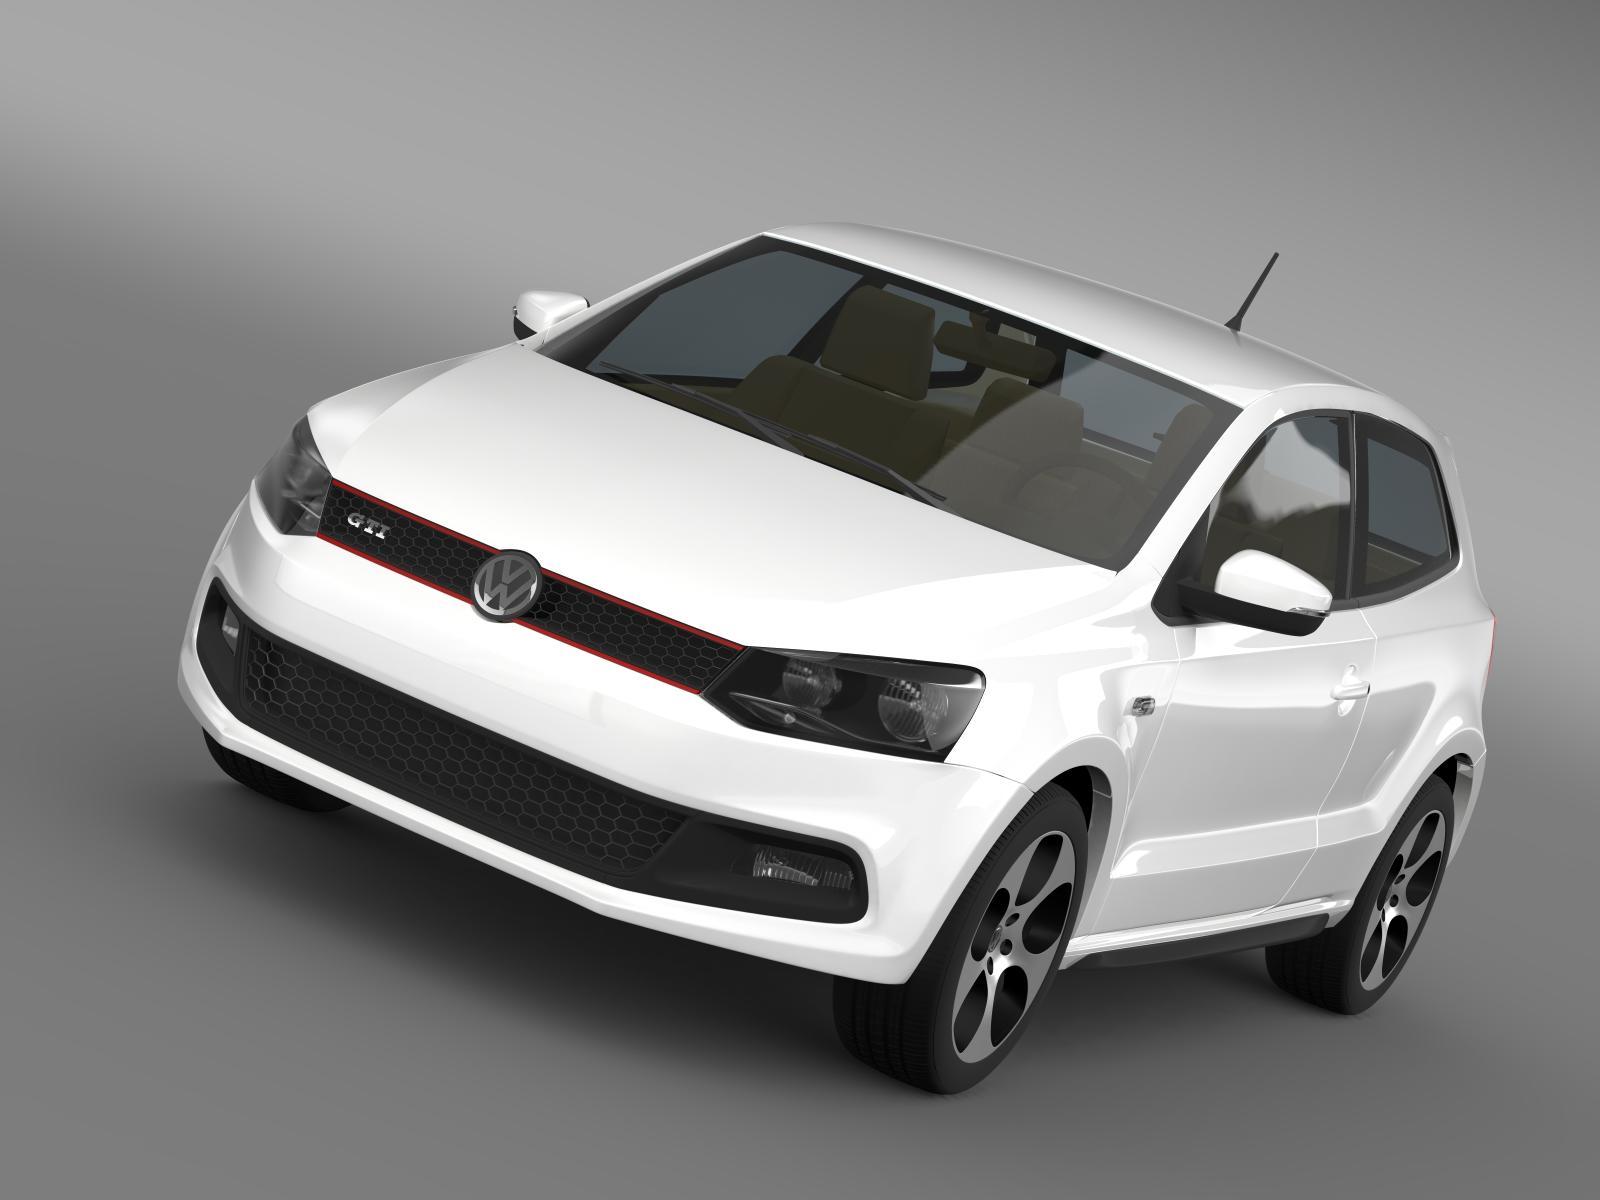 Volkswagen polo gti 3d 2009-2013 3d líkan 3ds hámark fbx c4d lwo ma mb hrc xsi obj 161960